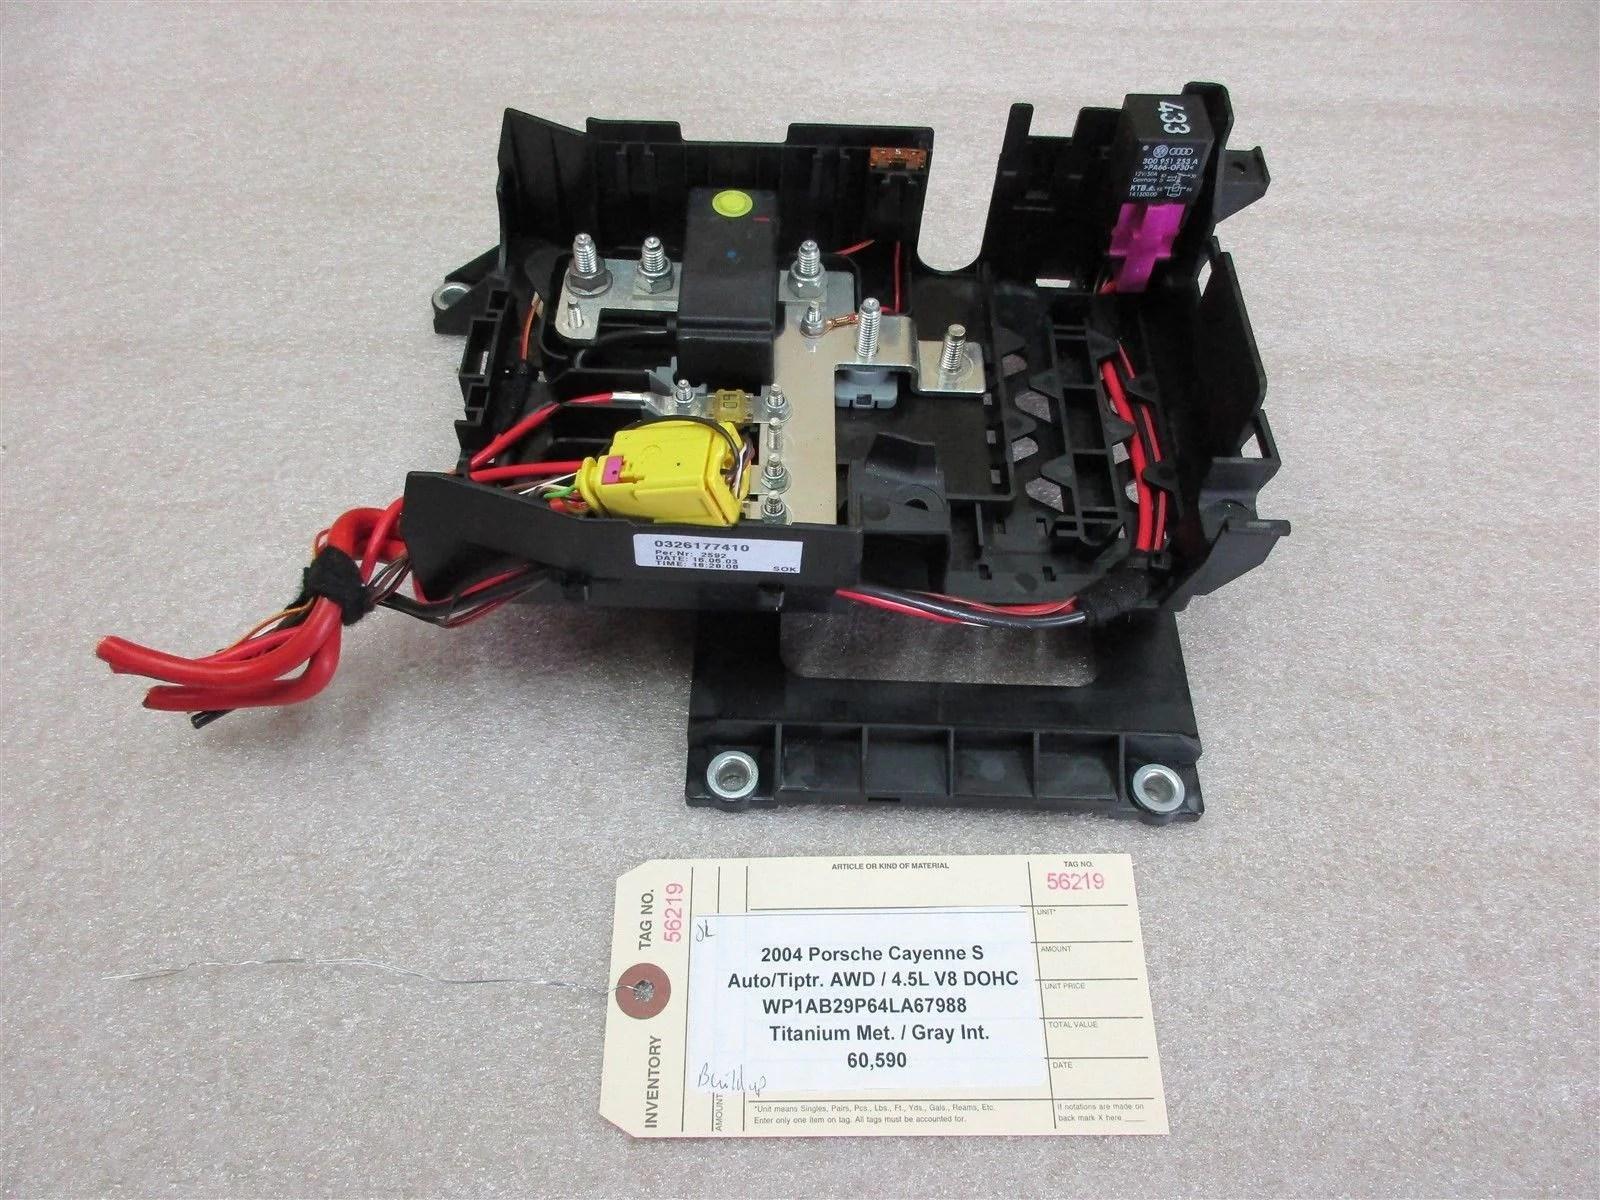 medium resolution of 04 cayenne s awd porsche 955 seat fuse box relay 7l0937548 2012 jaguar xj fuse box 2004 porsche cayenne fuse box